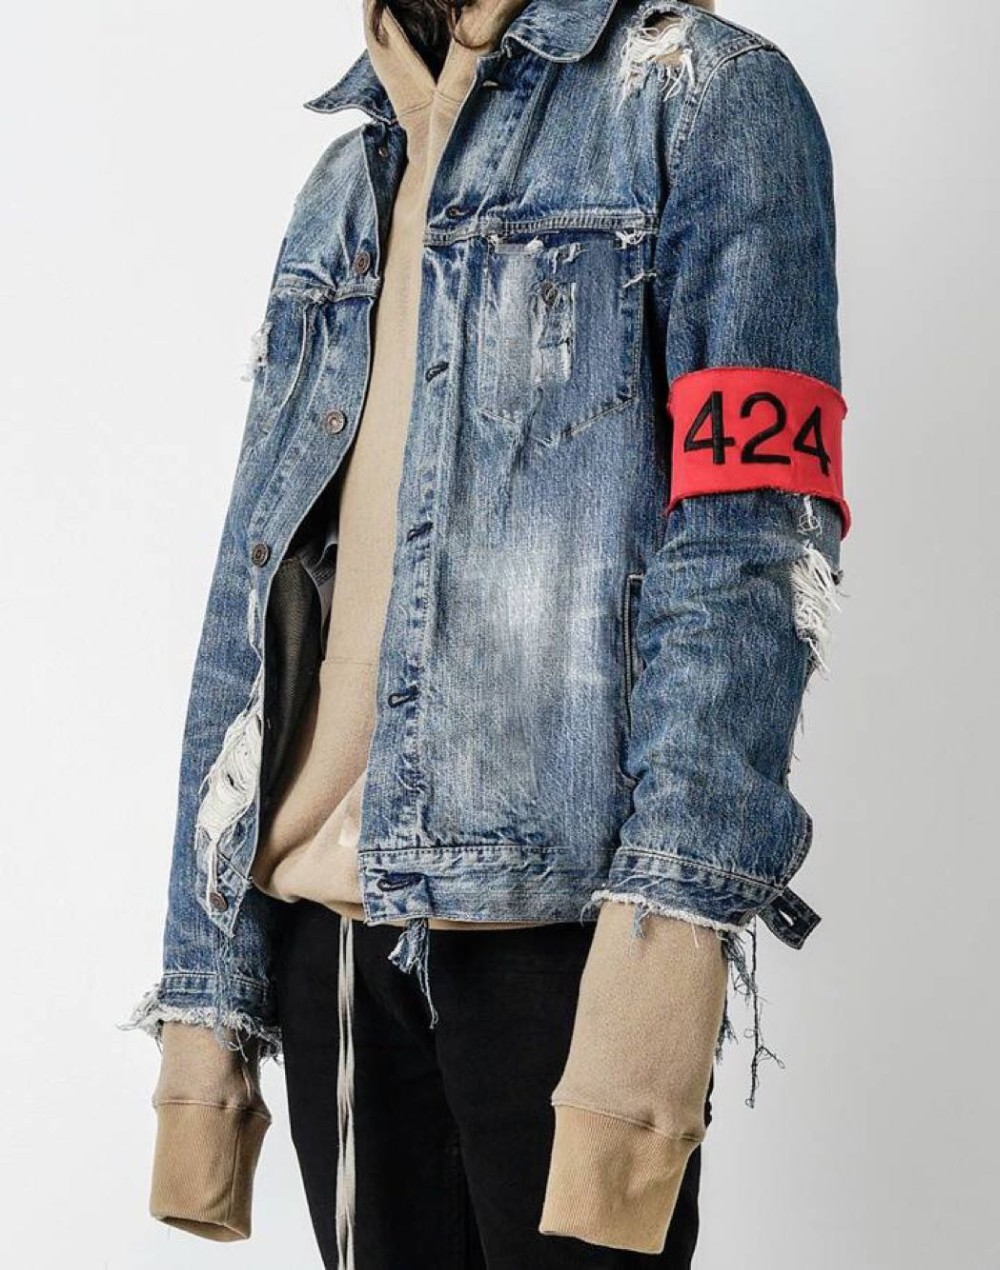 jean jacket dress tumblr